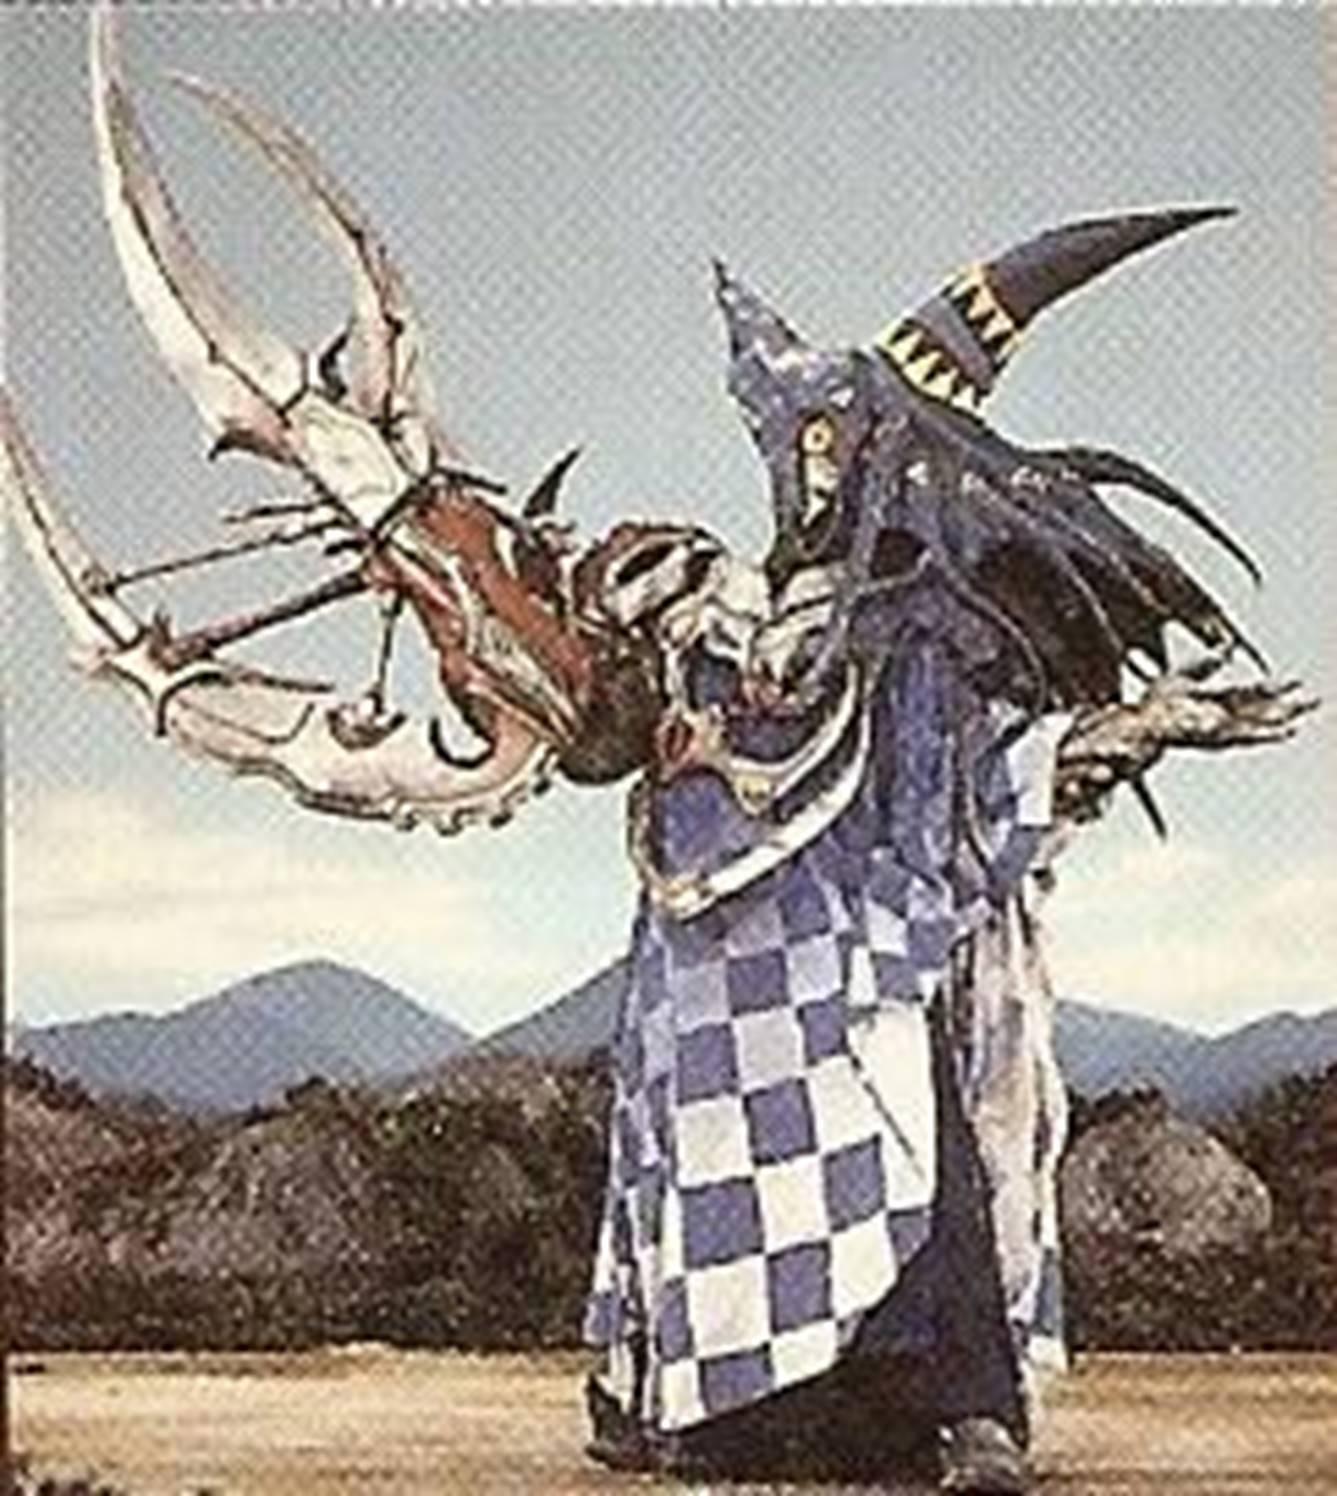 Amikiri (Kakuranger)